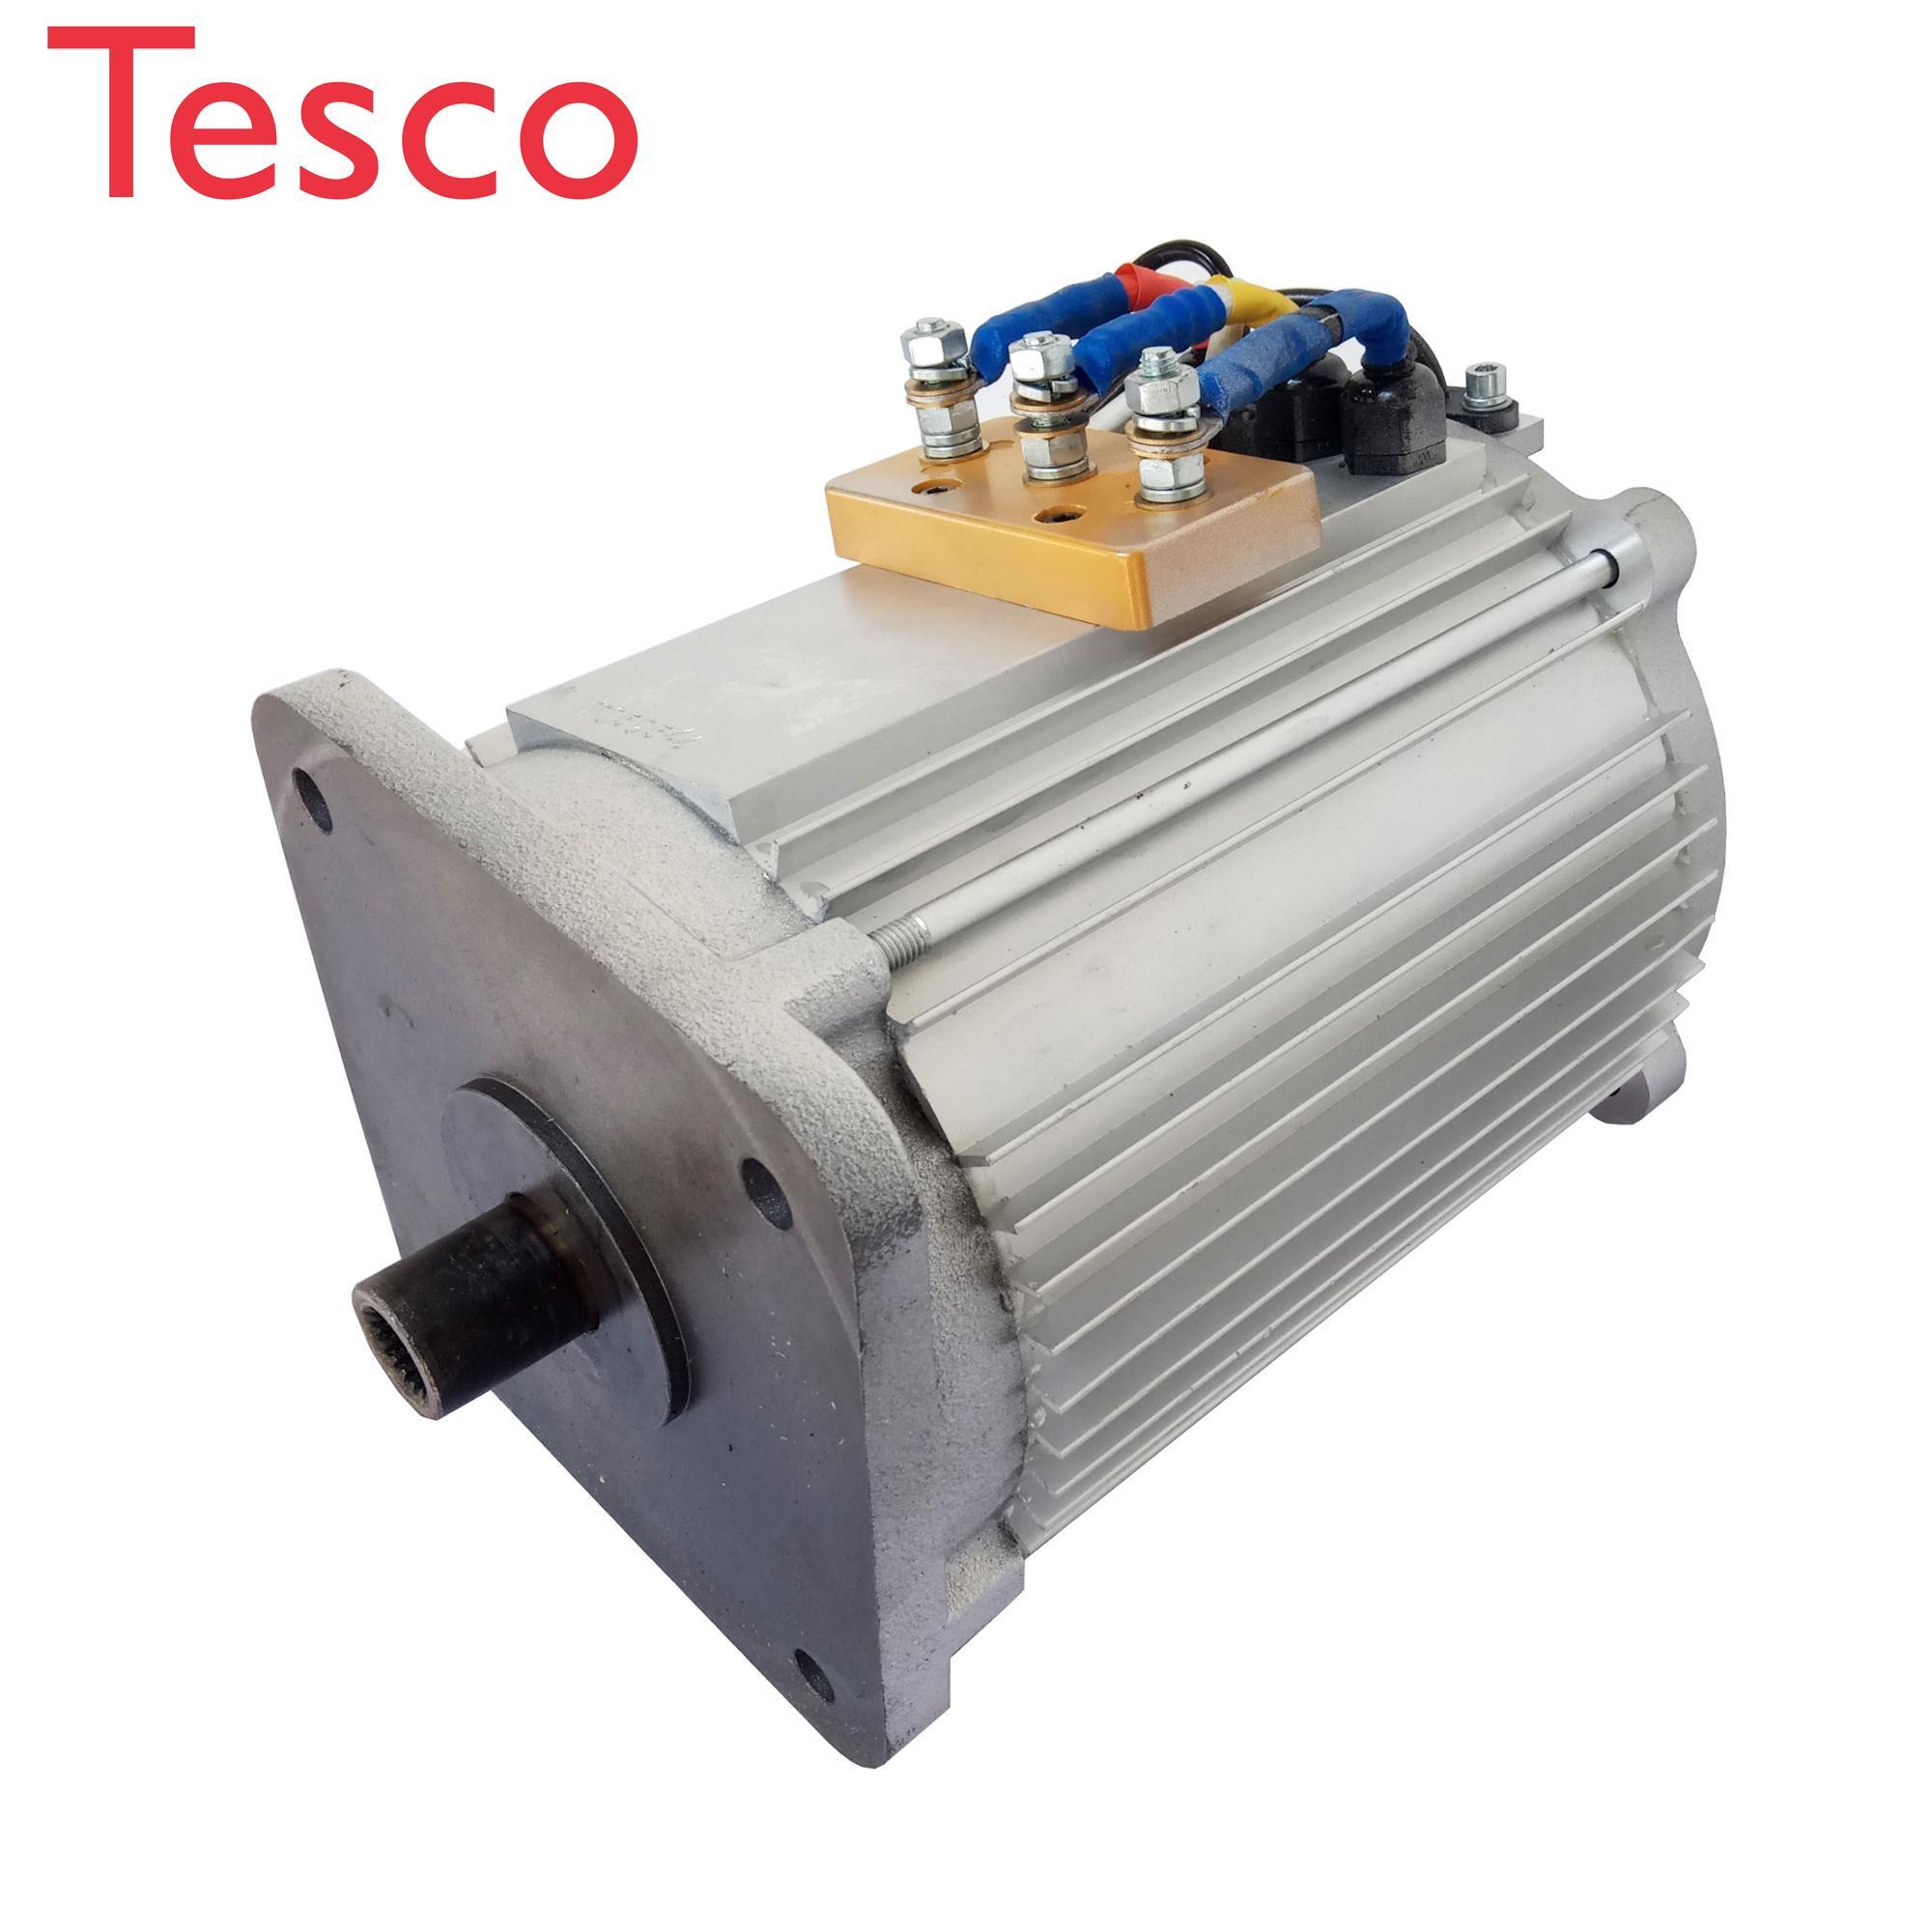 Rc Car Servo Motor 15000w Car Electric Motor Conversion Kit Electric Motors 49069